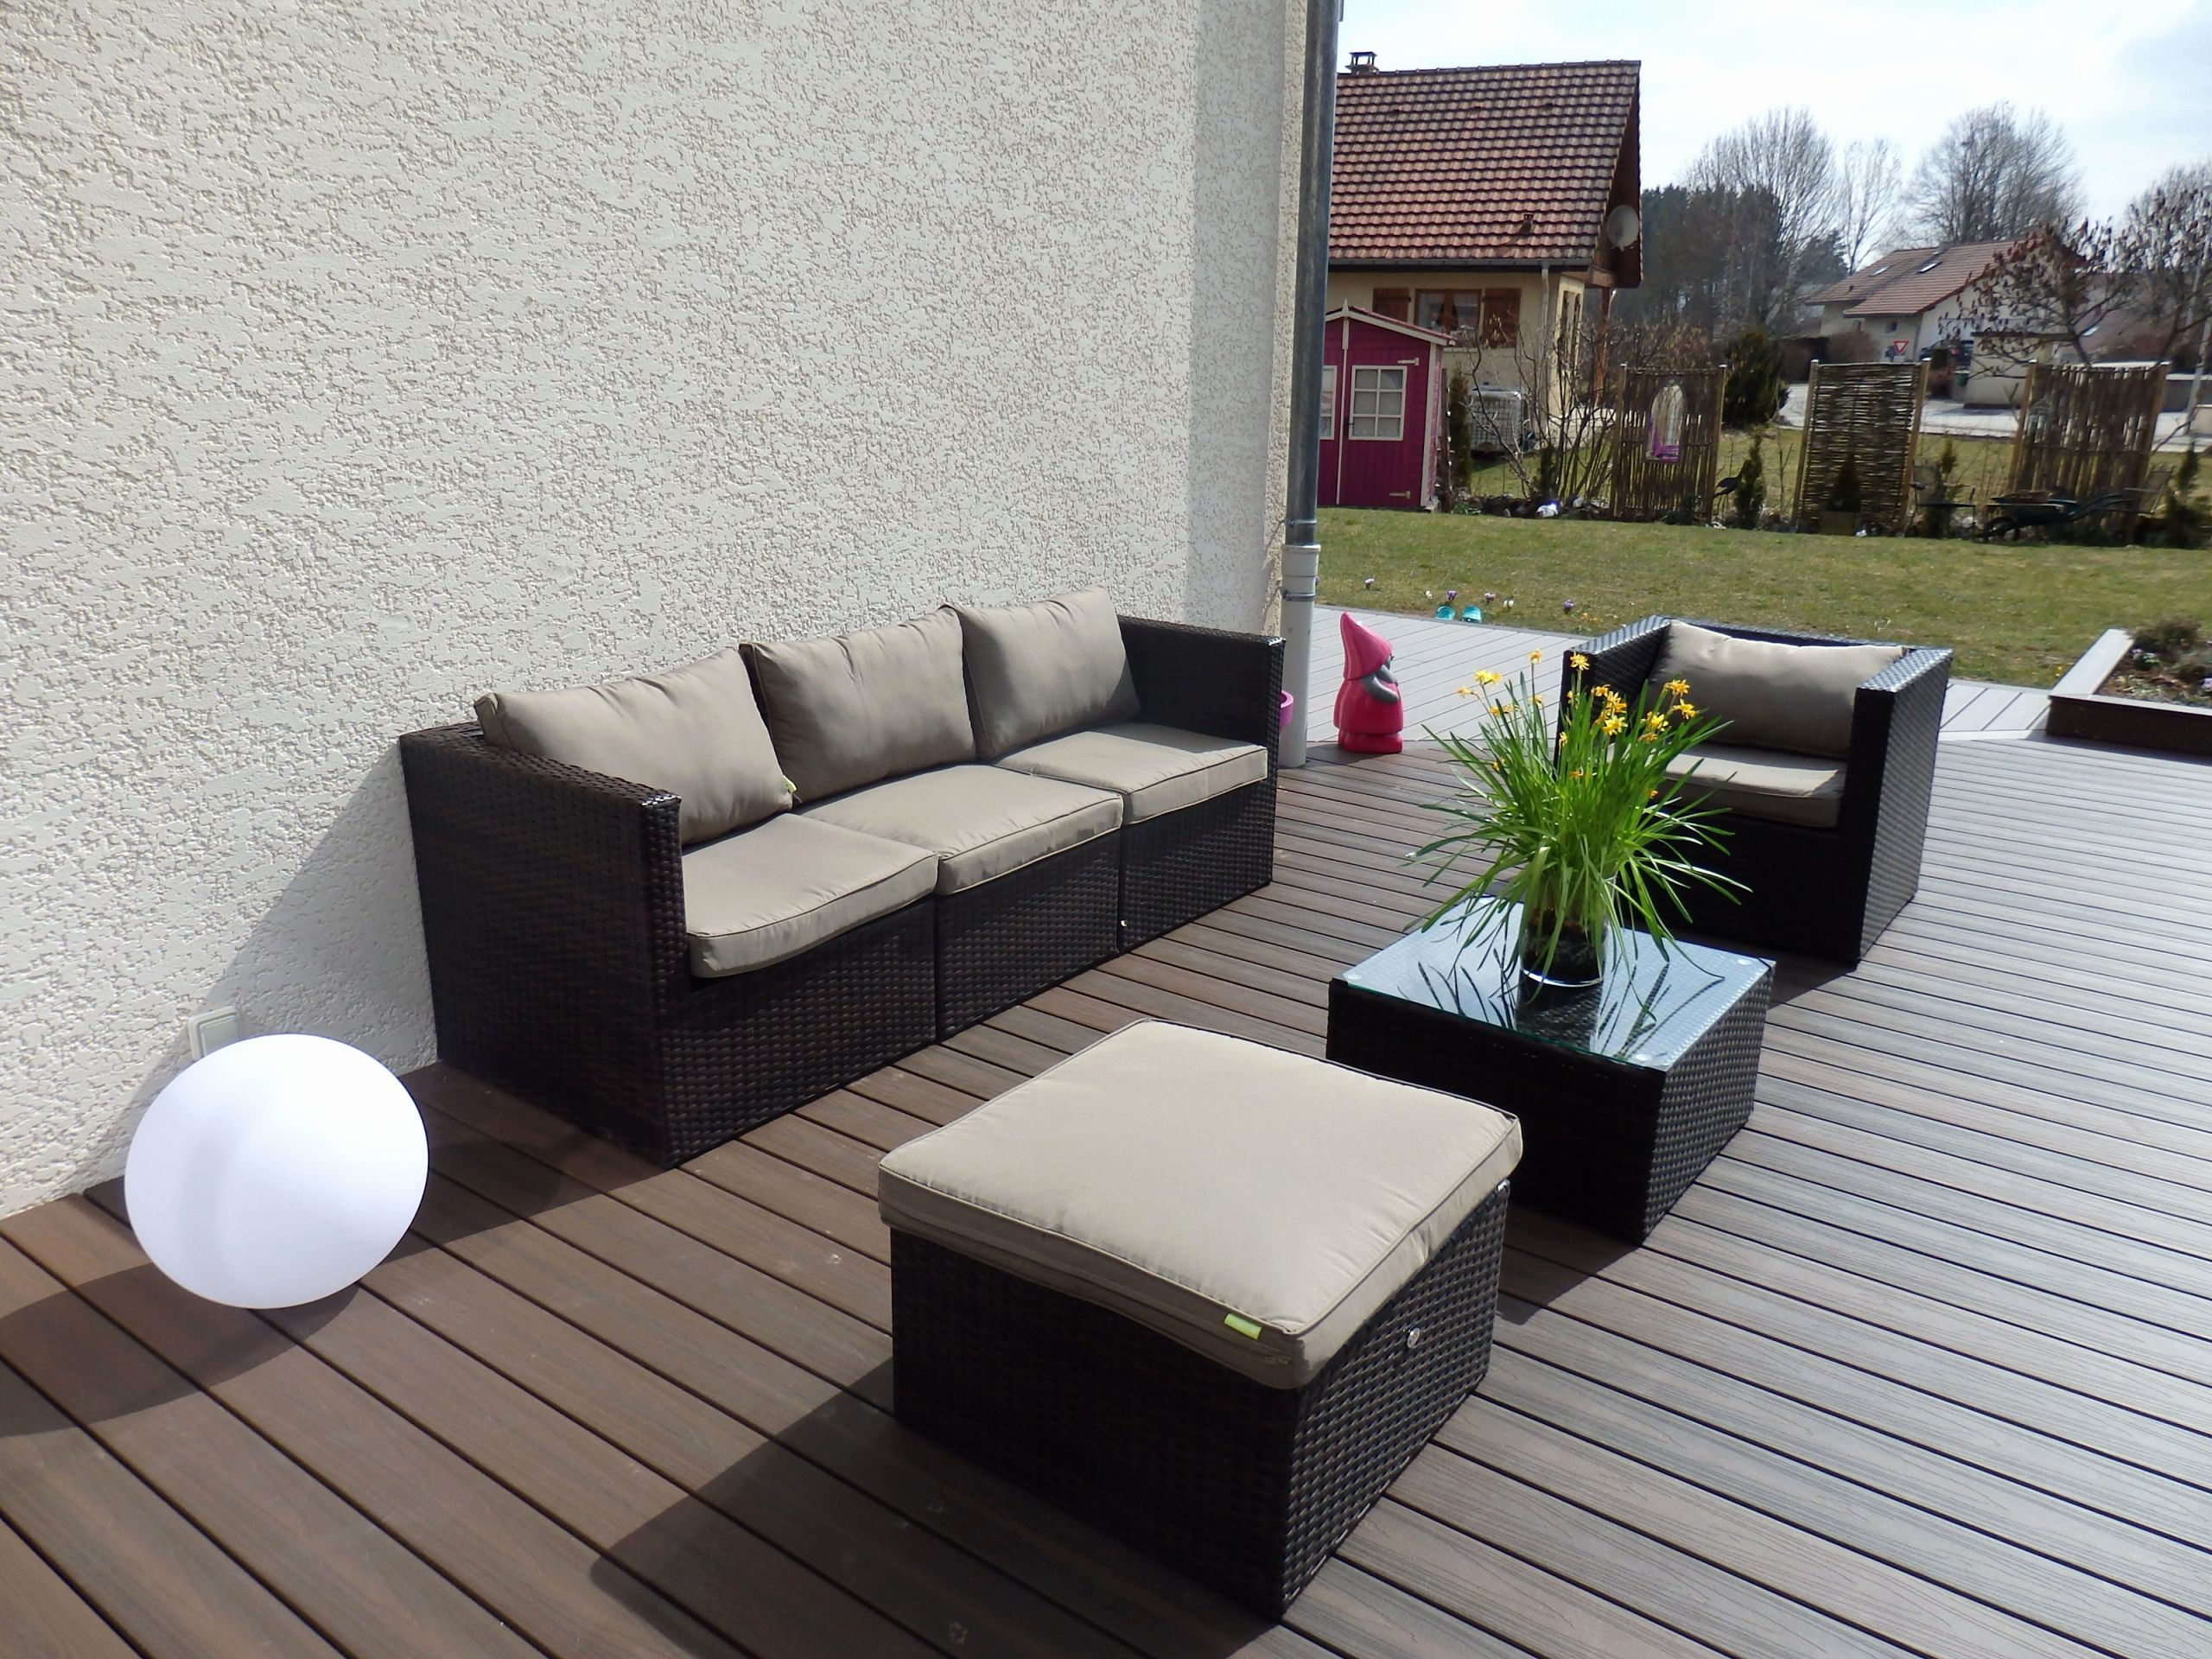 dalle terrasse pas cher occasion luxe salon de jardin aluminium en solde elegant fermob occasion terrasse of dalle terrasse pas cher occasion